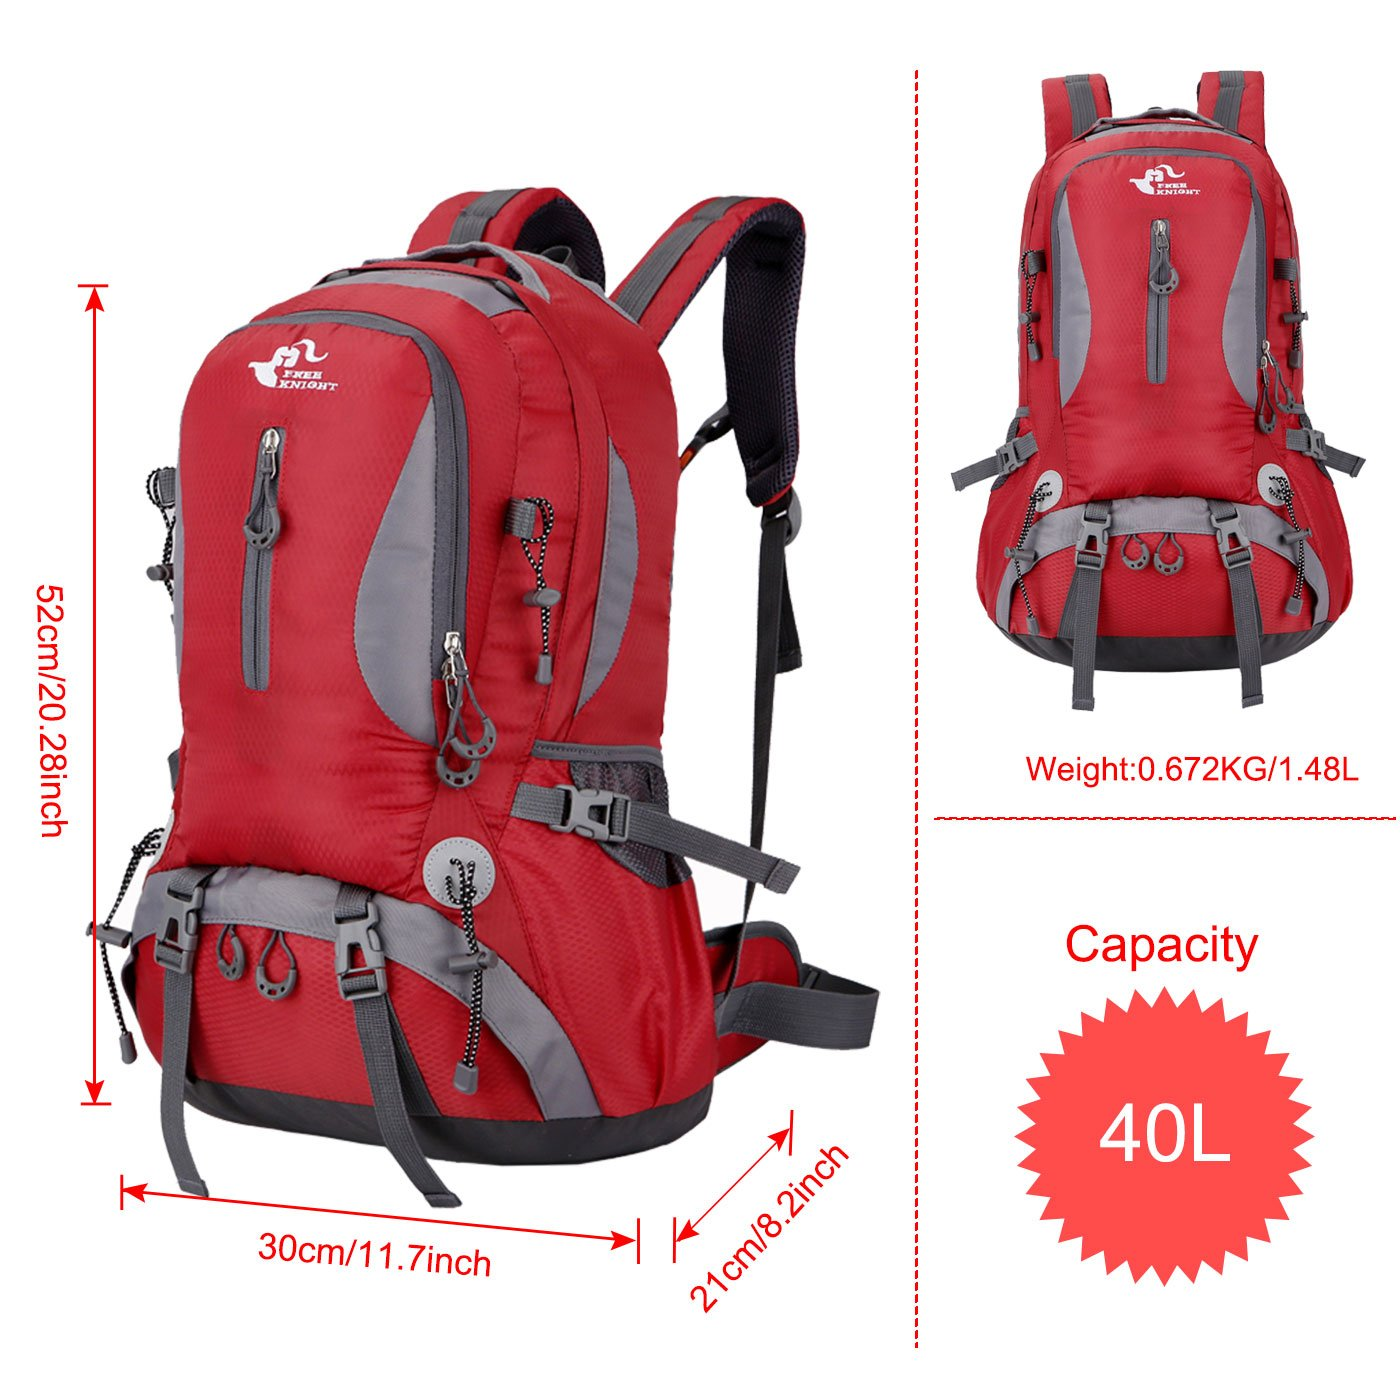 Mochila al Aire Libre de Gran Capacidad Mochila Impermeable de Senderismo Camping Paquete del Alpinismo Escalada Marcha Trekking 30 x 52 x 21 cm 40 L Free Knight